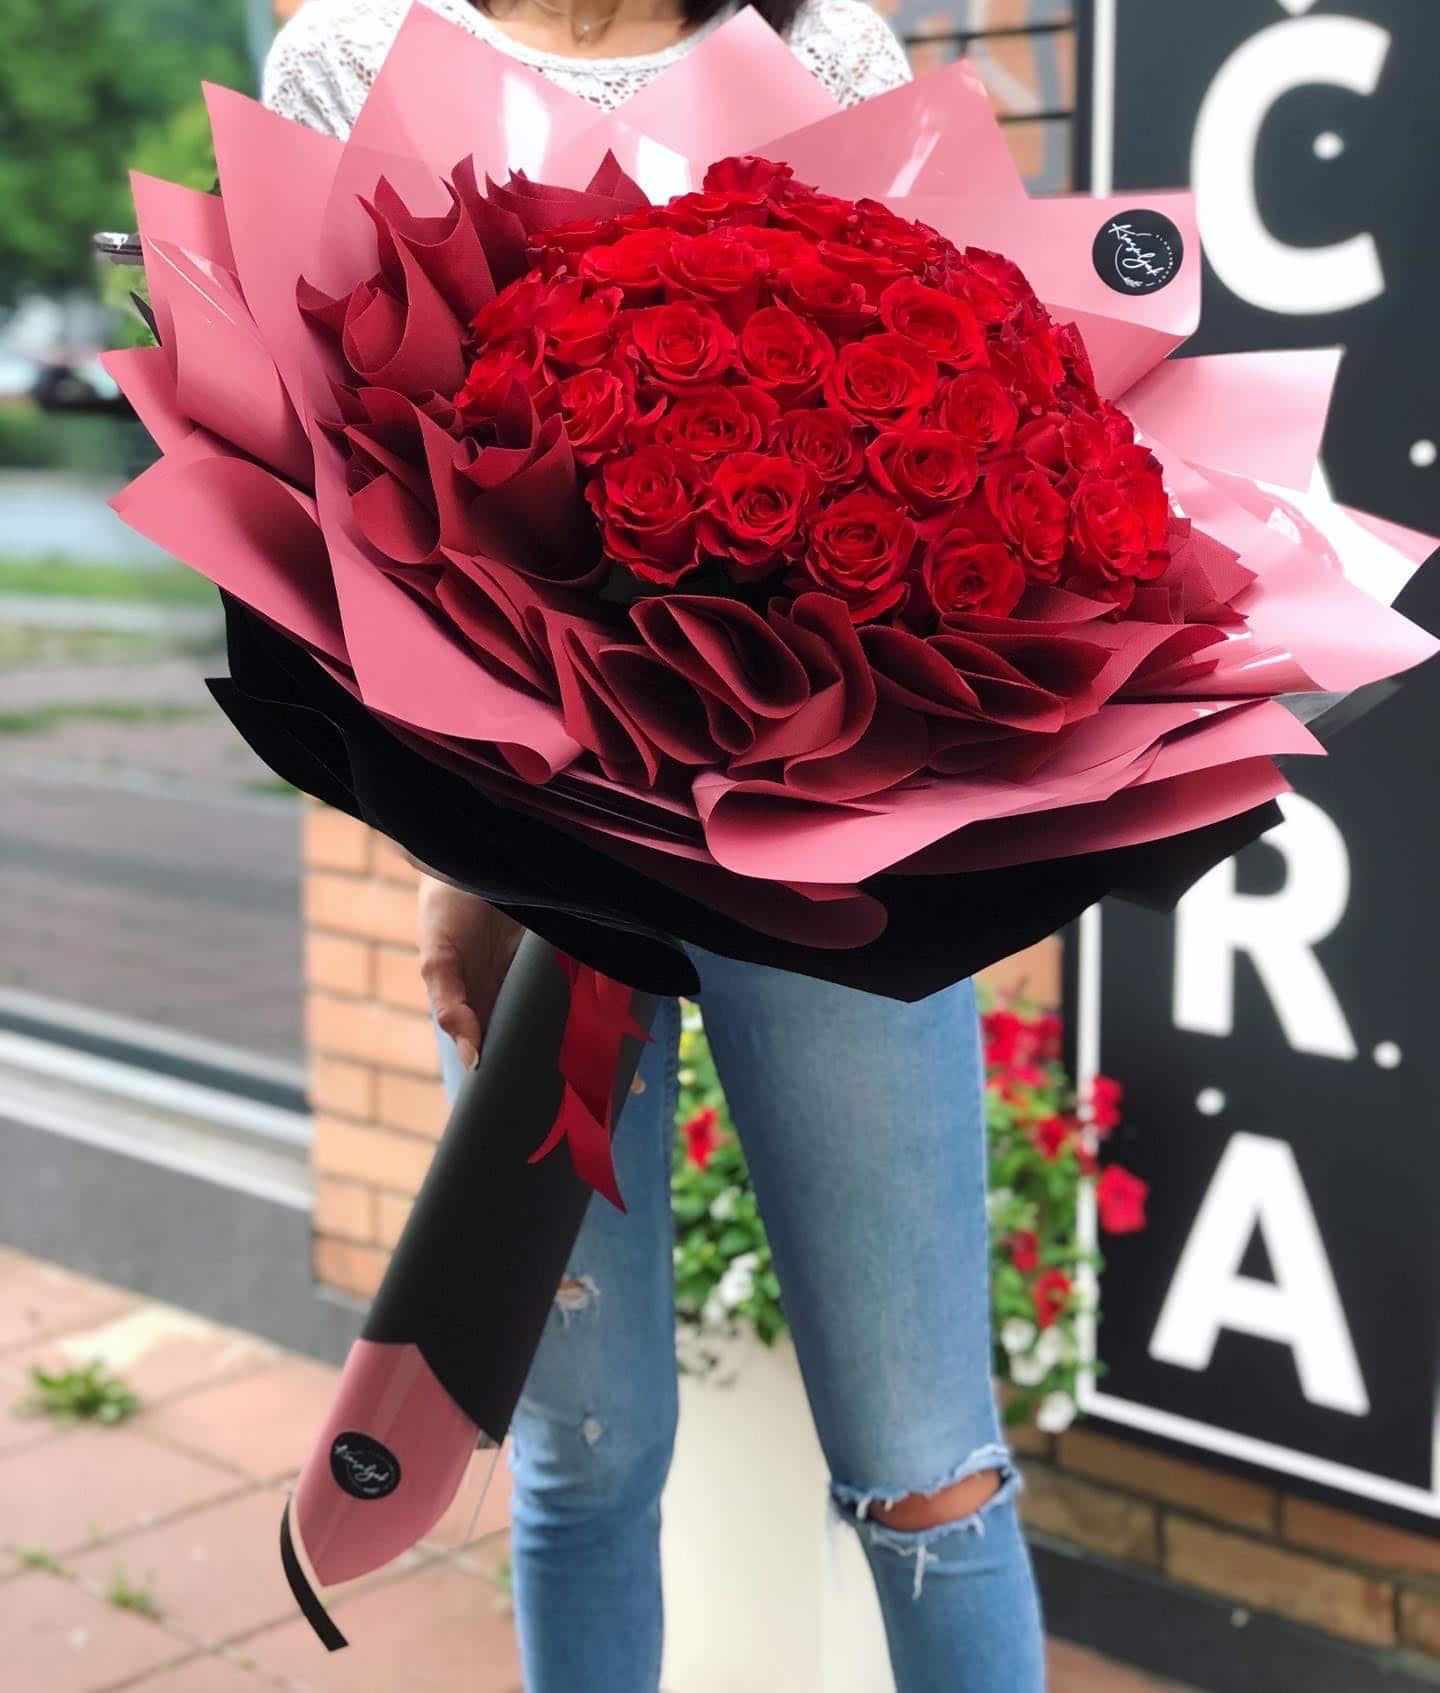 Cveće - buket crvenih ruža